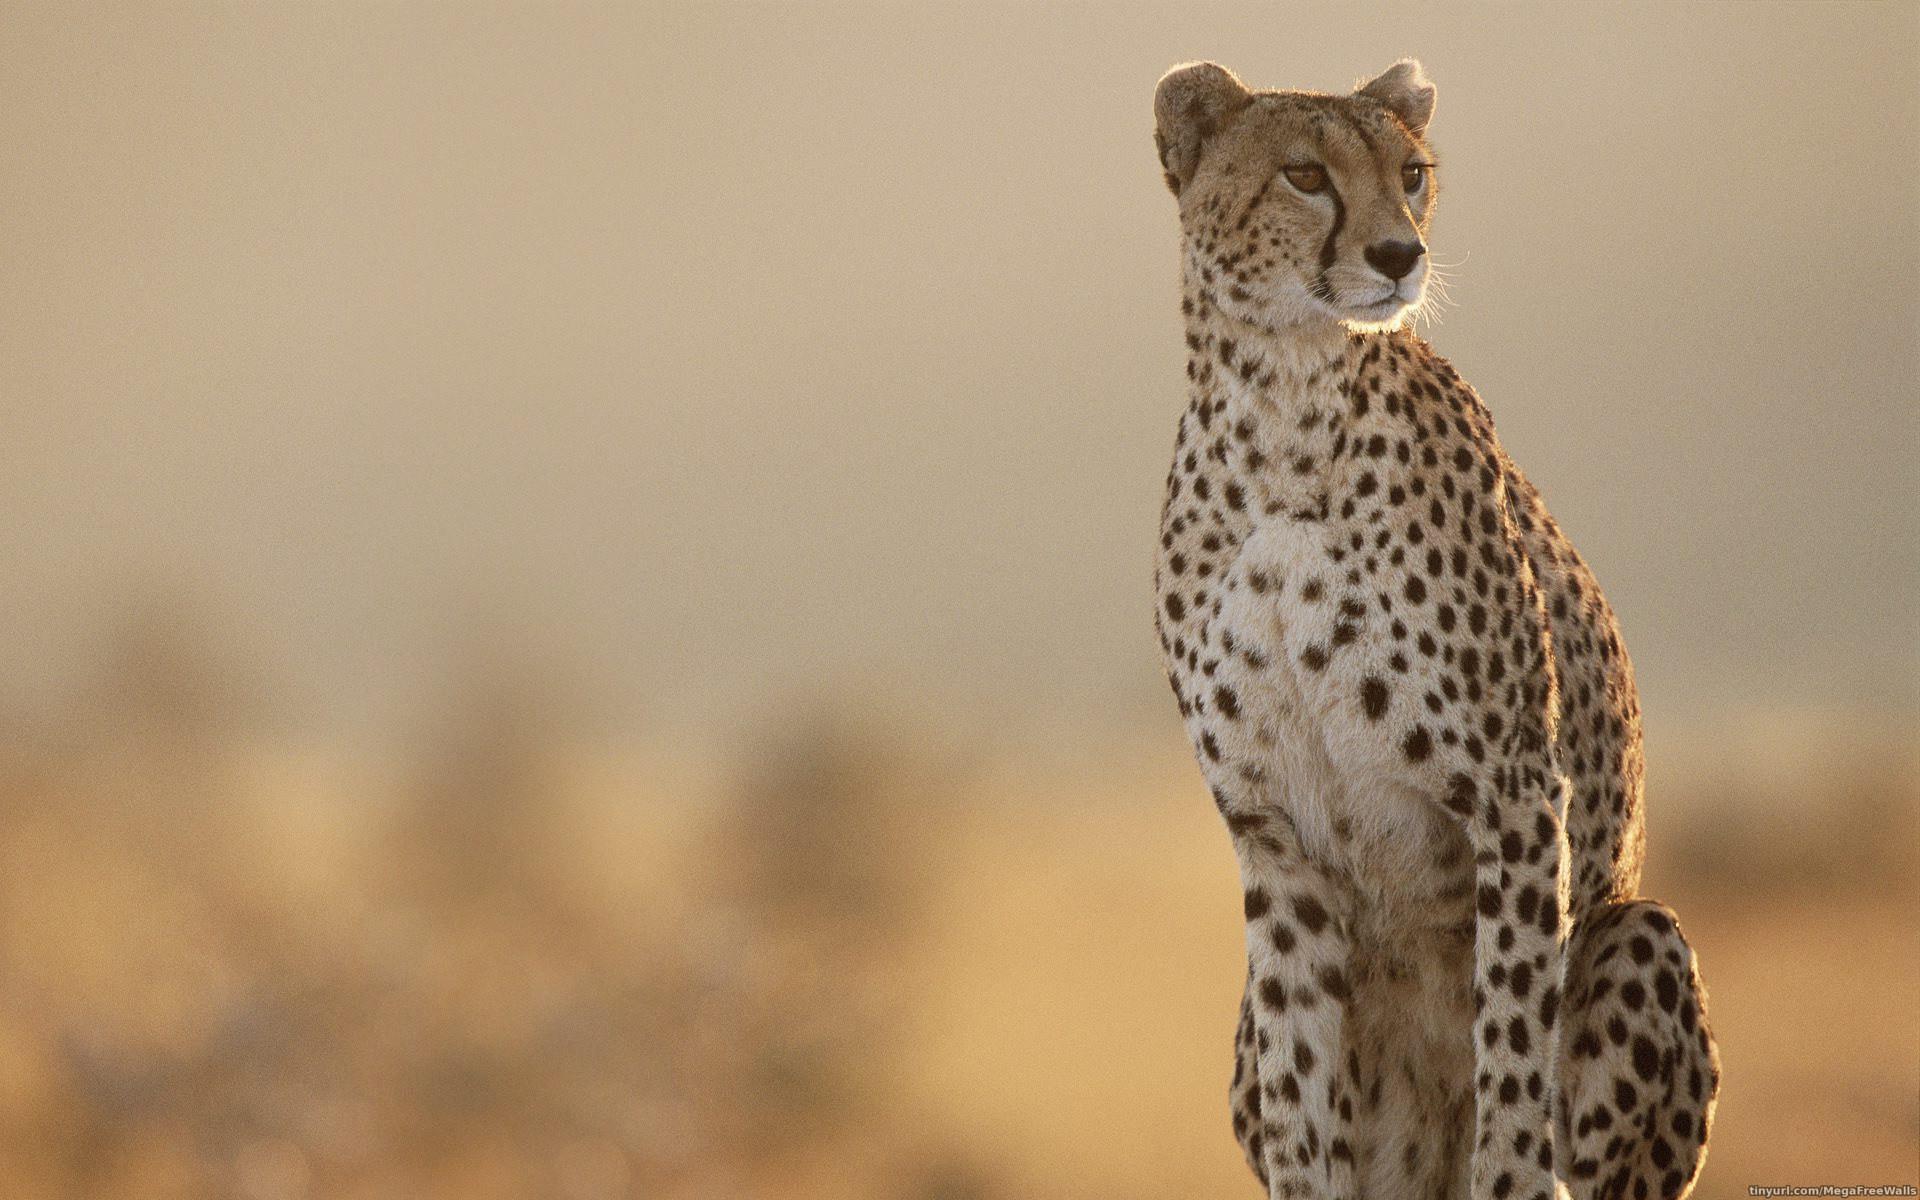 Res: 1920x1200, Cheetah Wallpapers